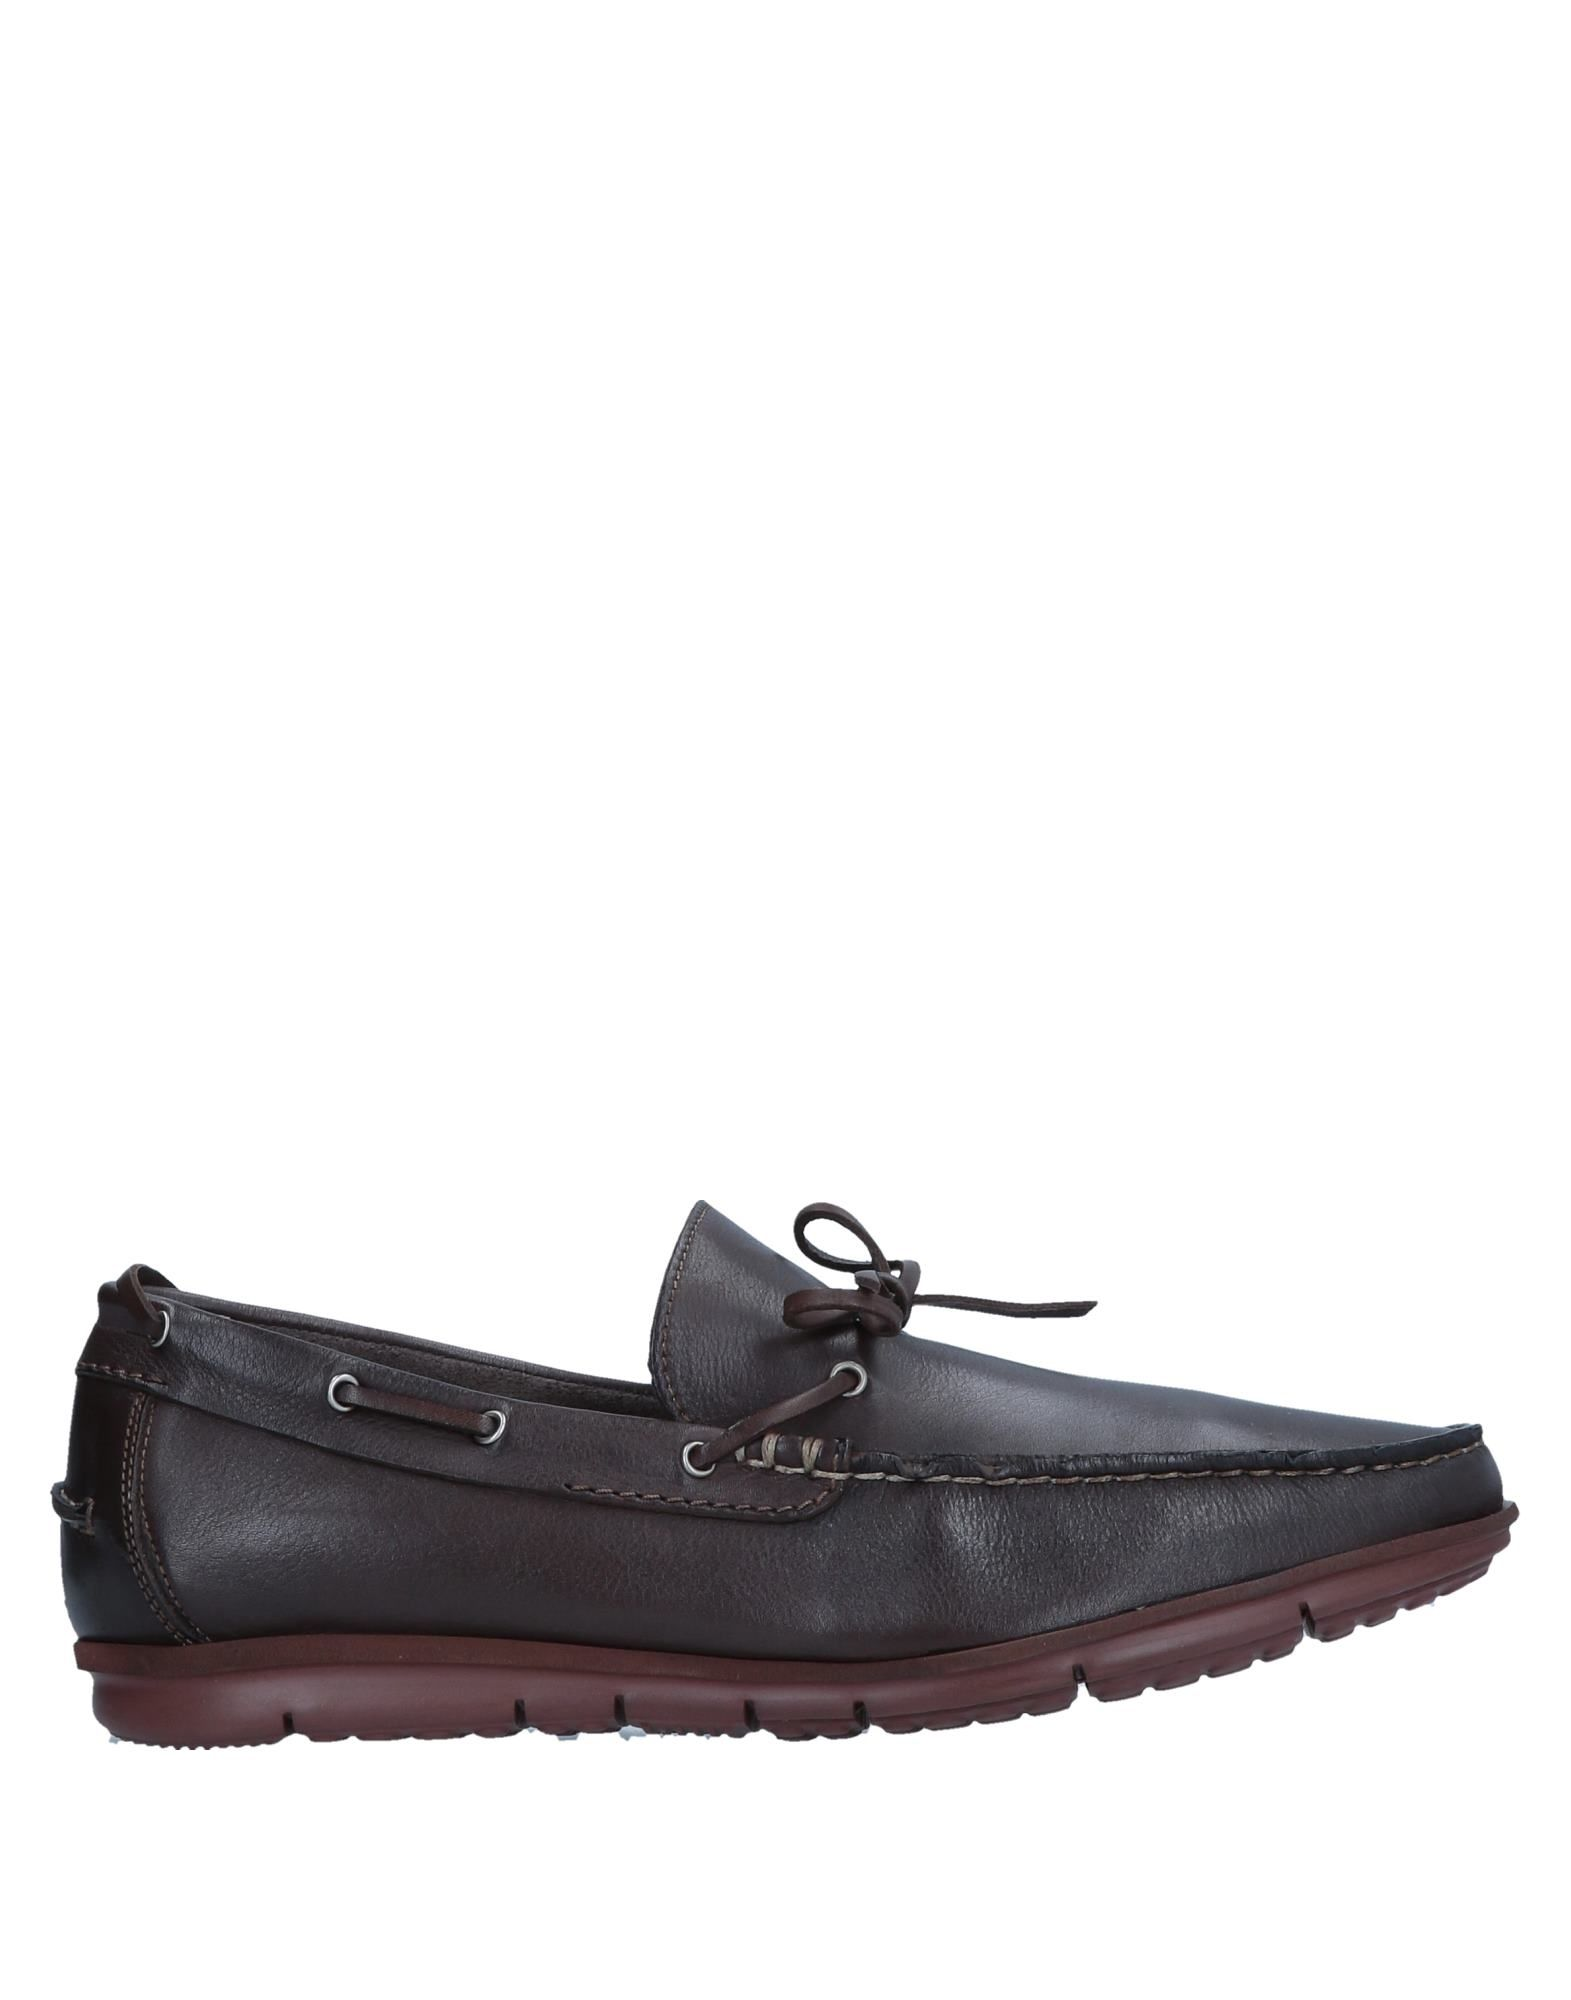 Rabatt echte Mokassins Schuhe Today By Calpierre Mokassins echte Herren  11551610GQ 0da66c